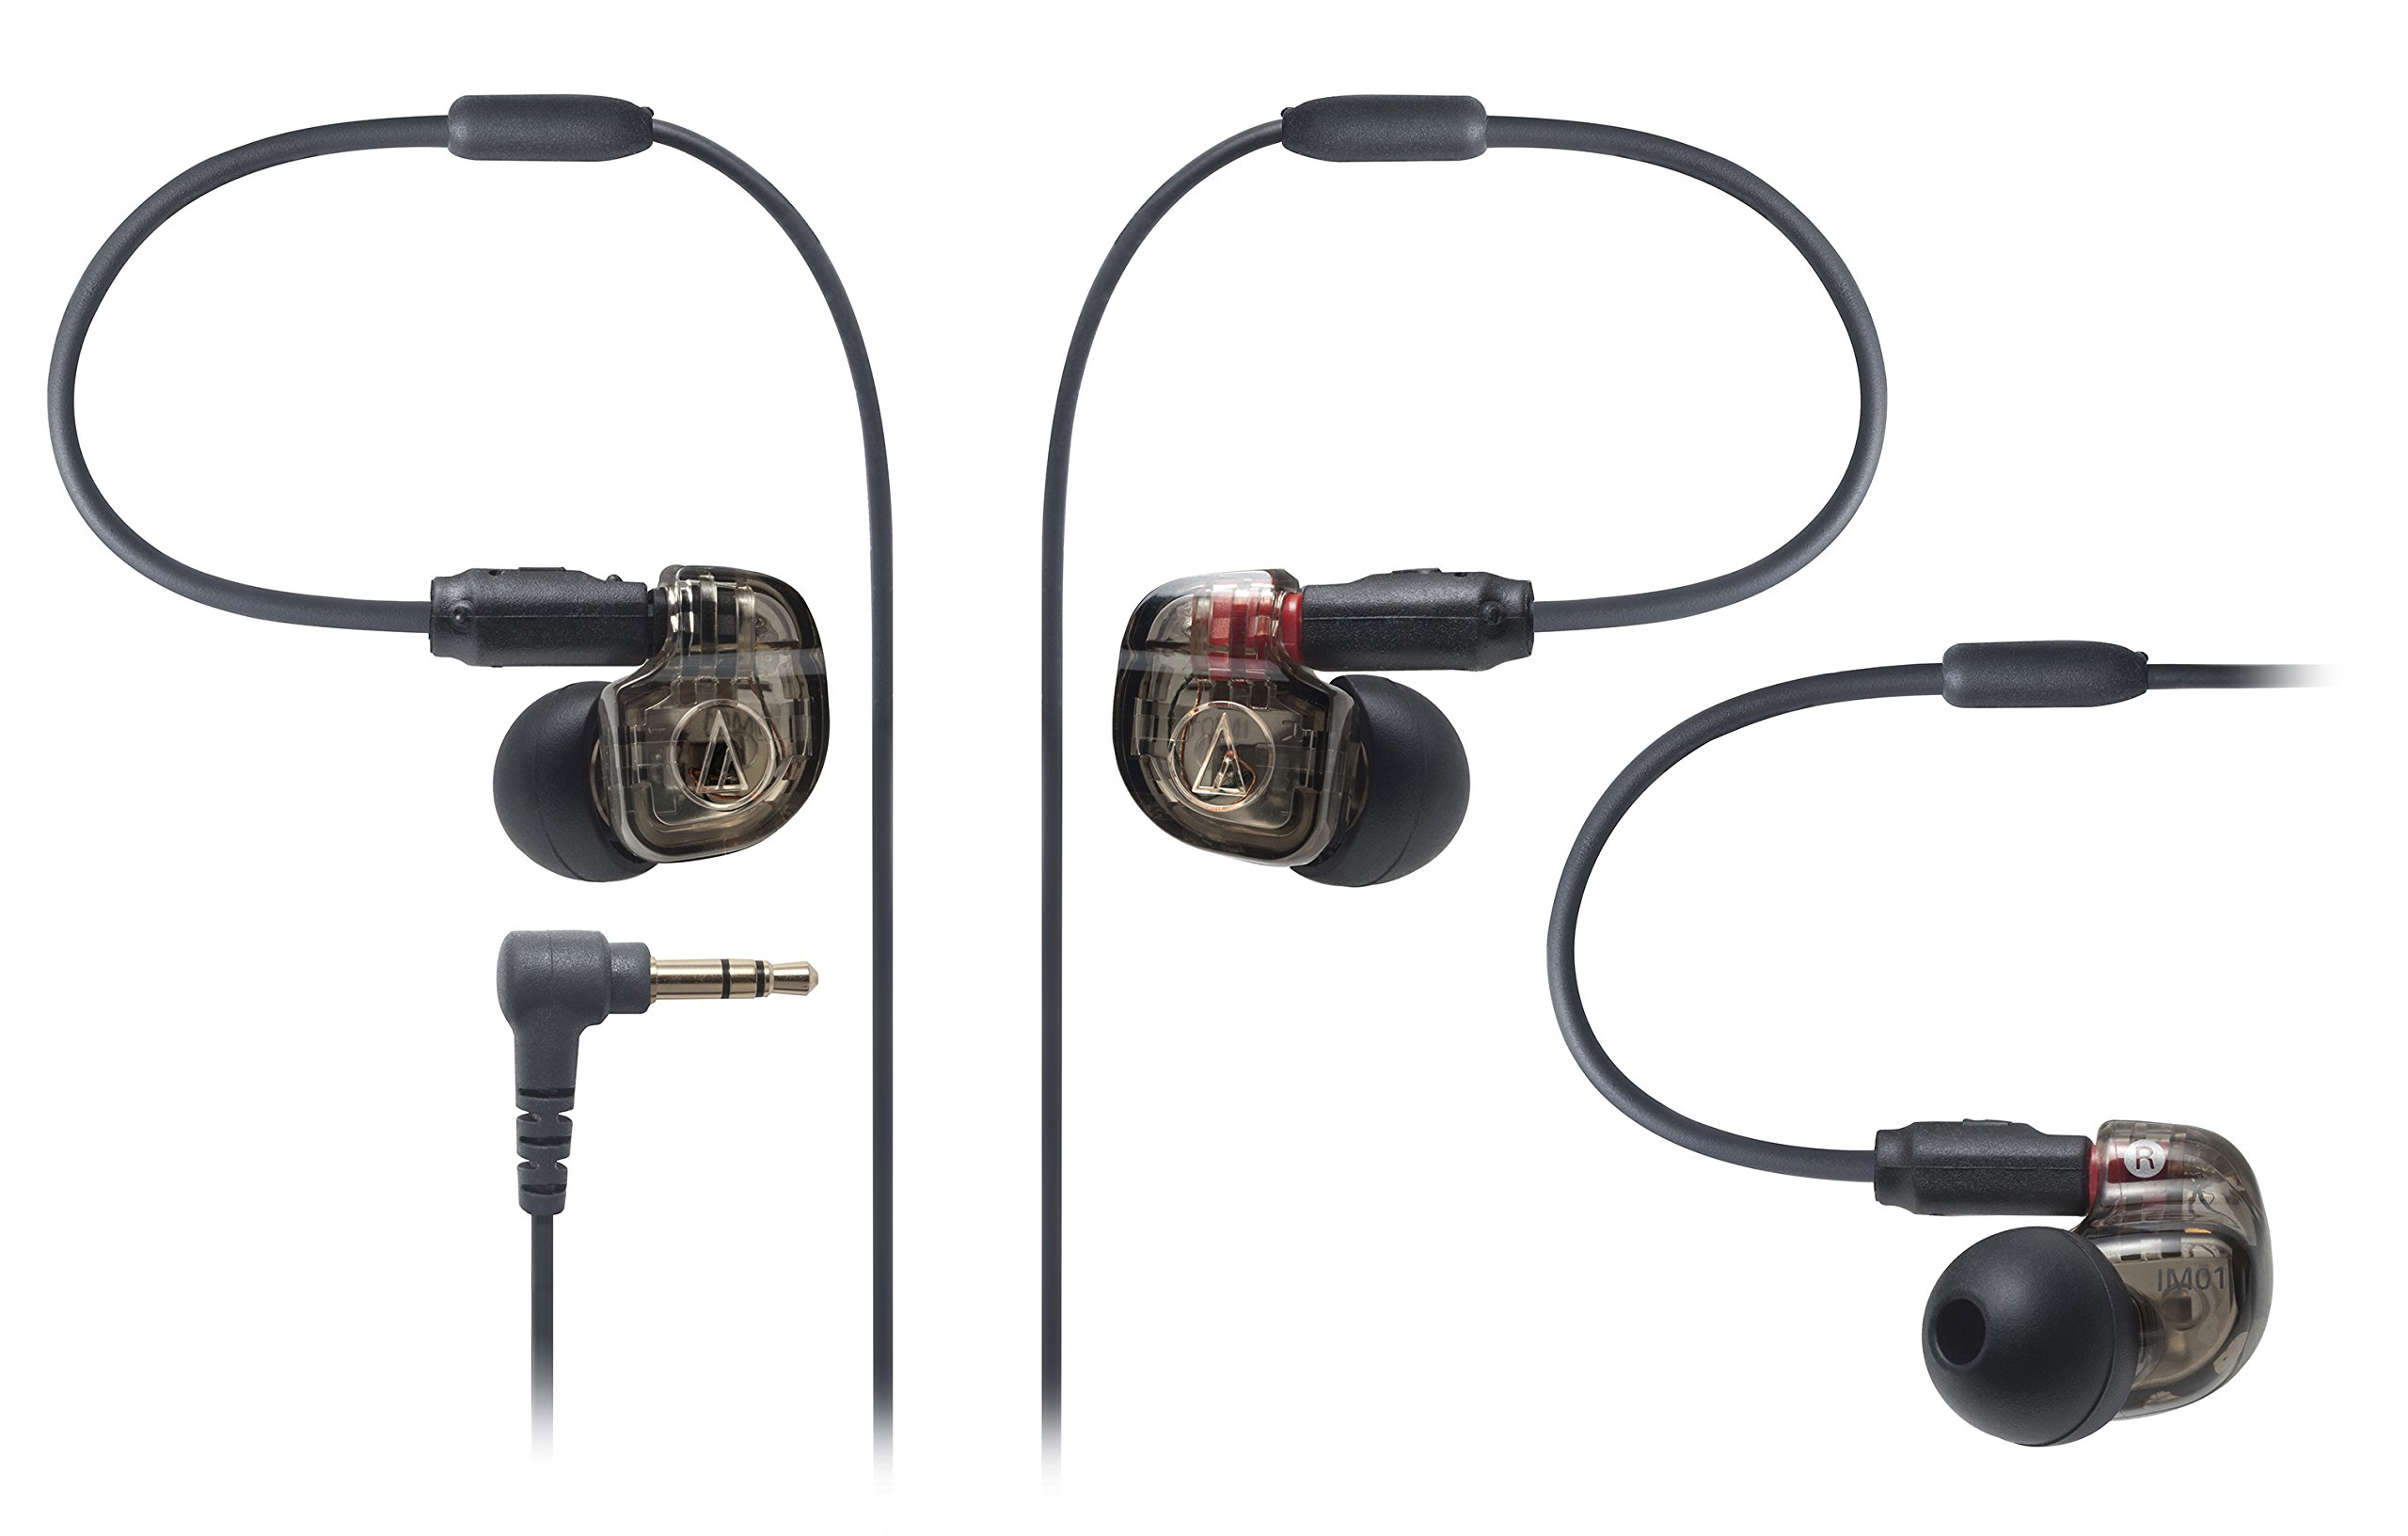 Audio Technica ATH-IM01 SonicPro Balanced In-Ear Monitor Headphones